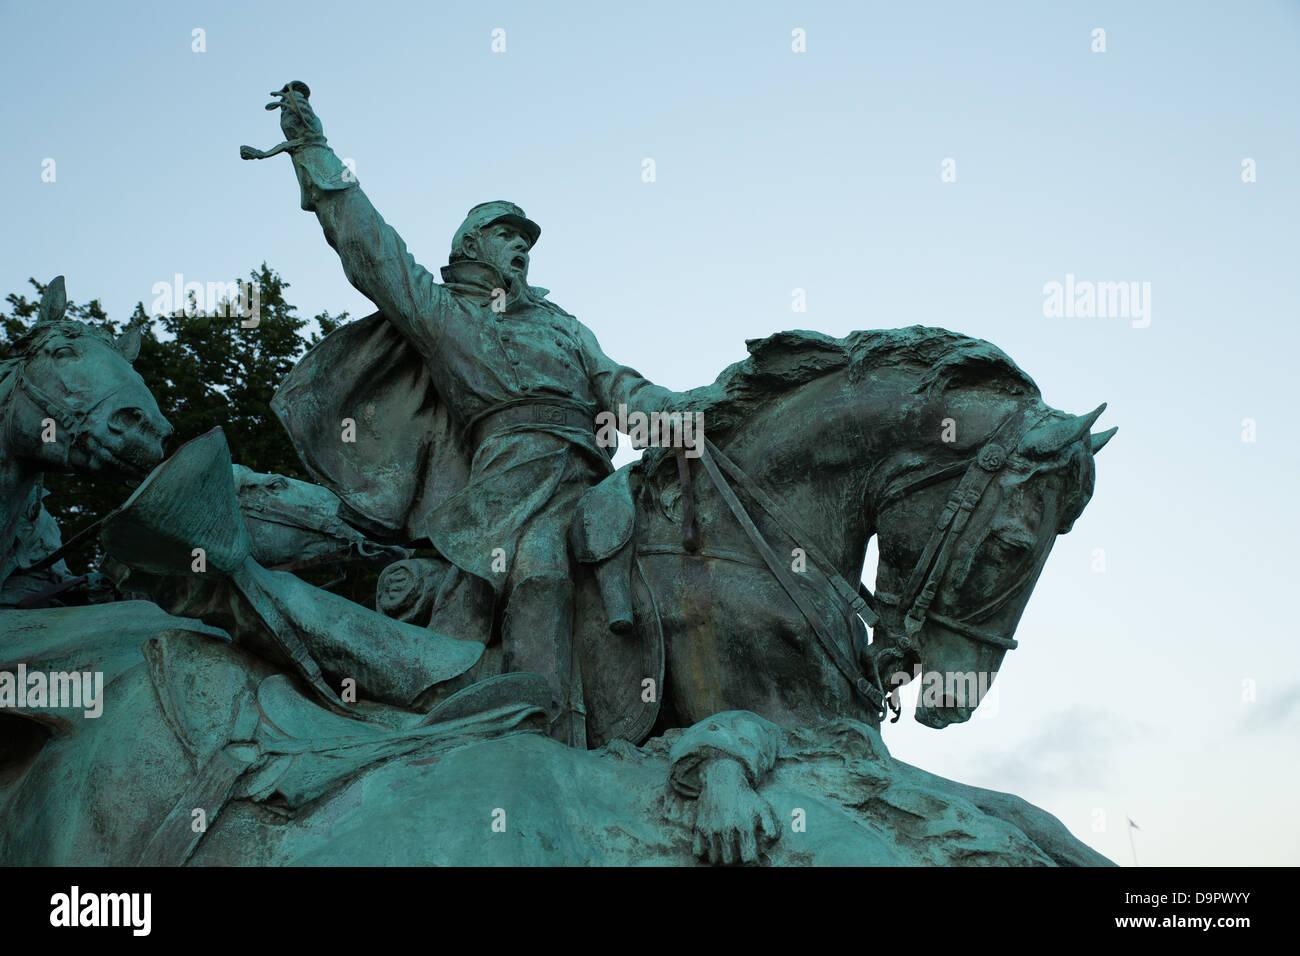 Ulysses S Grant Memorial, Washington, DC, USA - Stock Image